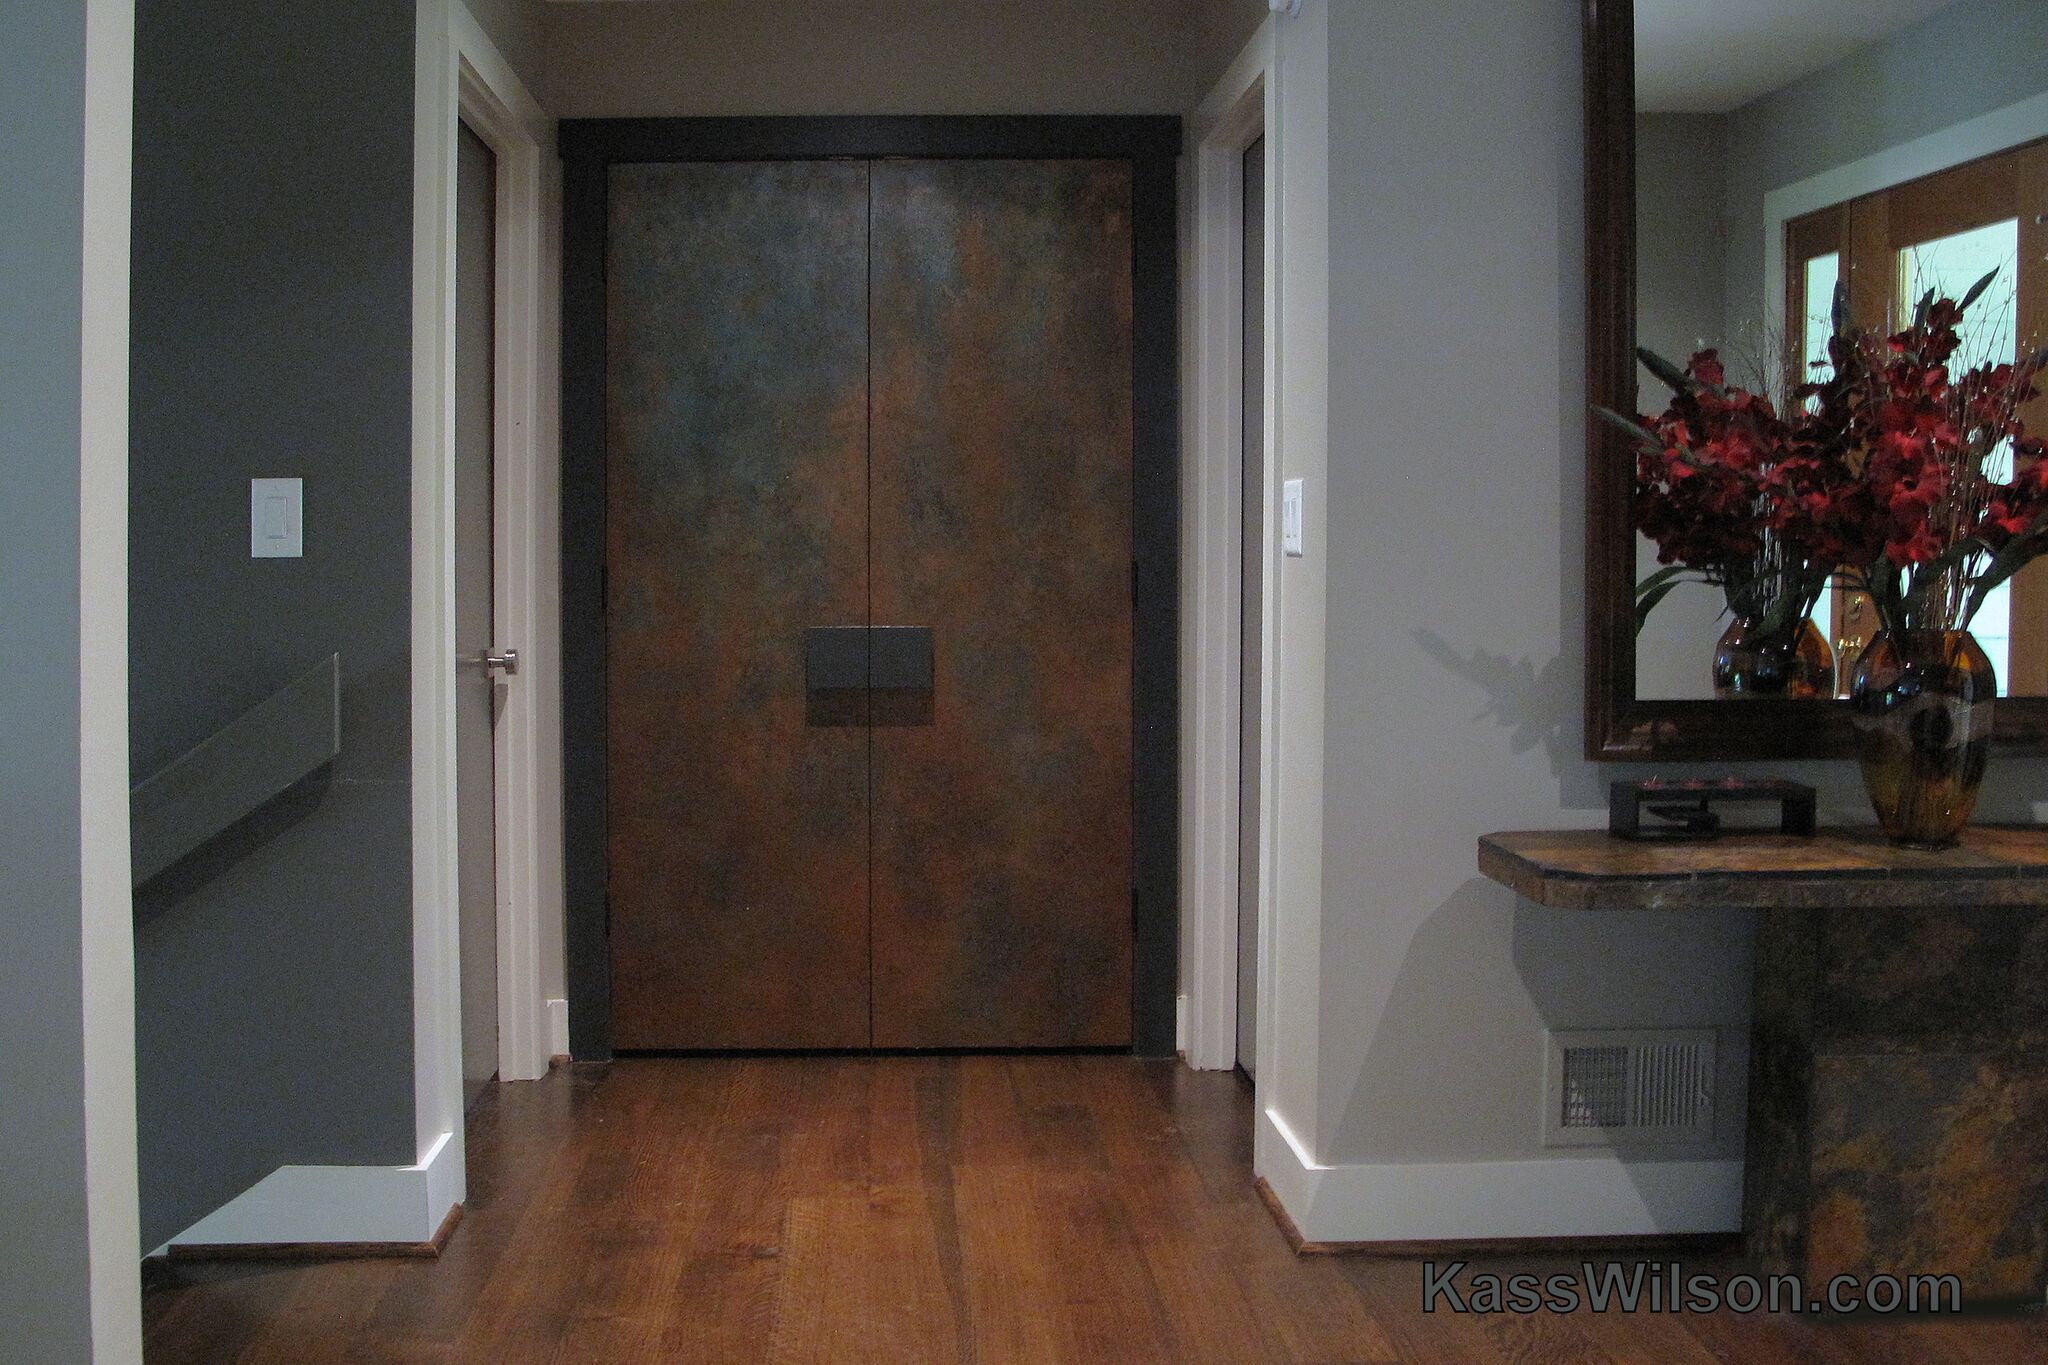 Painted copper doors as art